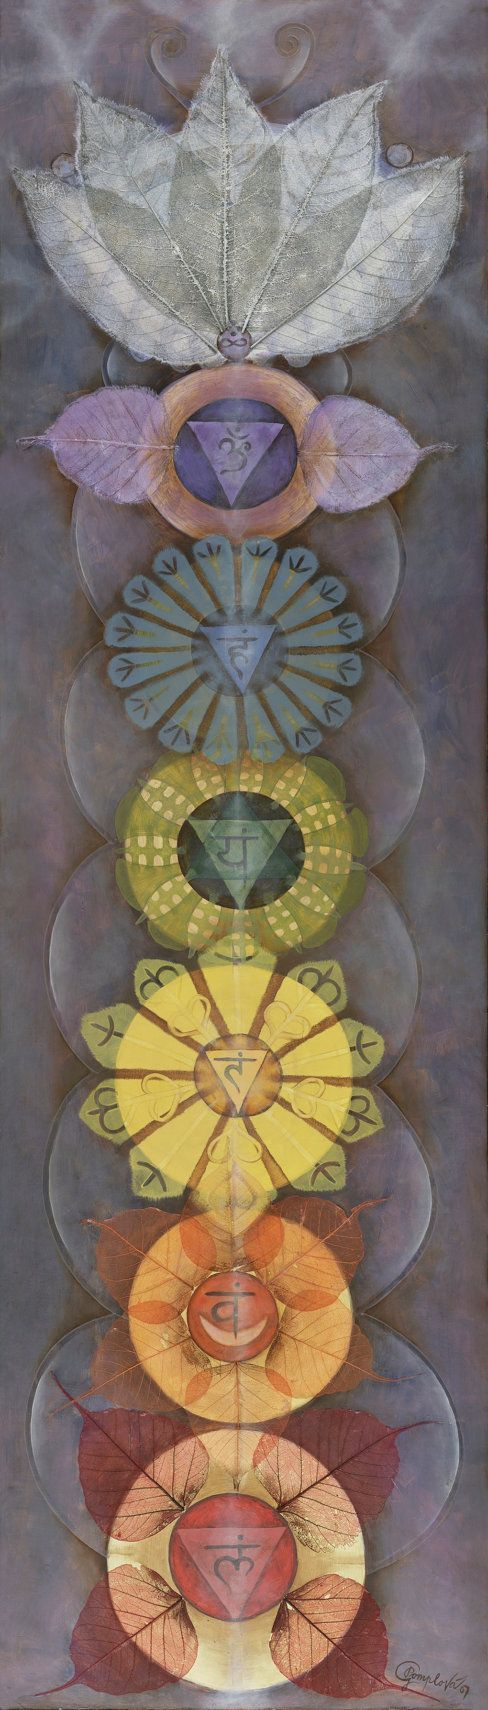 CHAKRAS energía de reiki yoga arte espiritual YOGA por GPyoga: